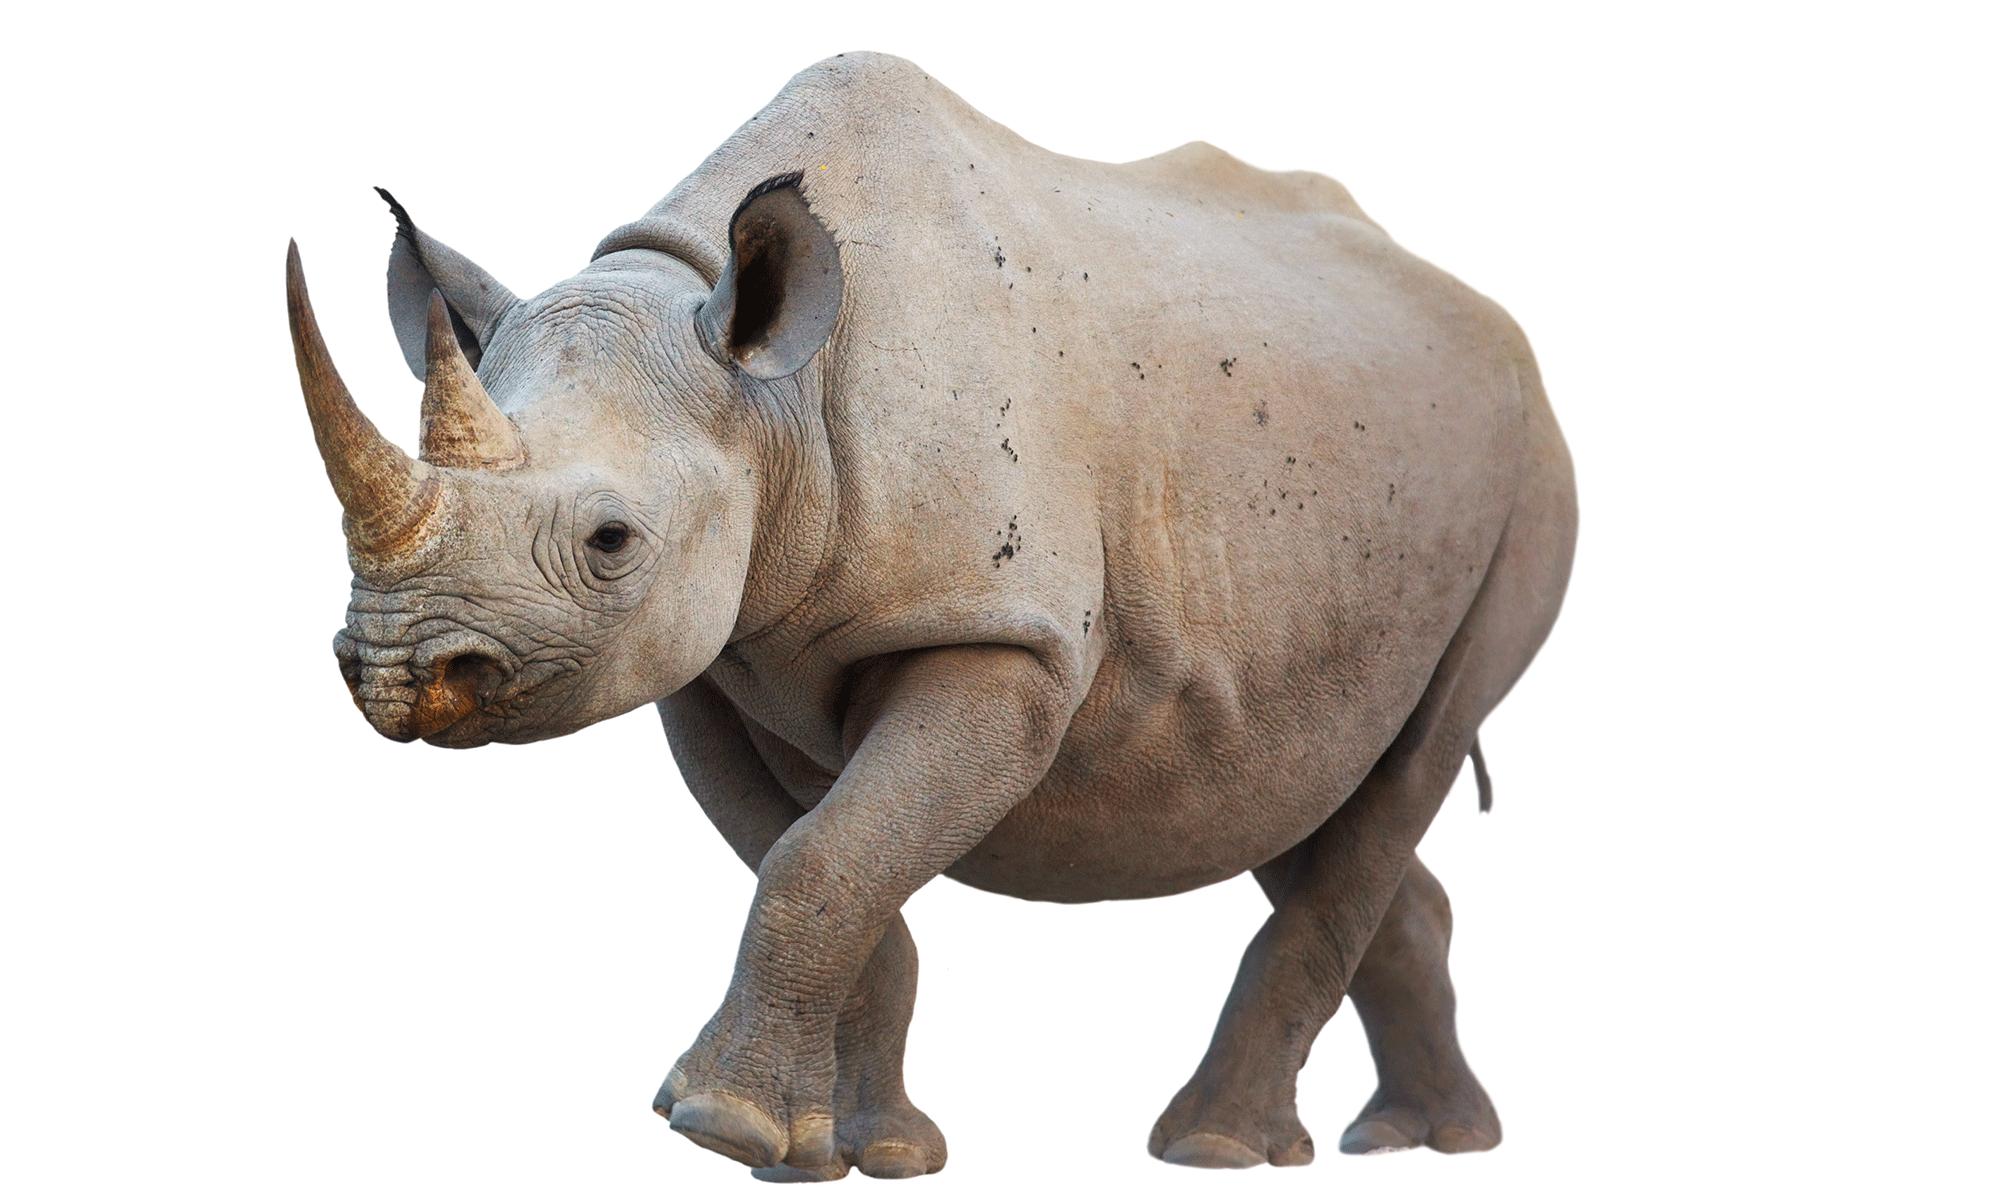 Wildlife Tracking - Wildlife, Transparent background PNG HD thumbnail